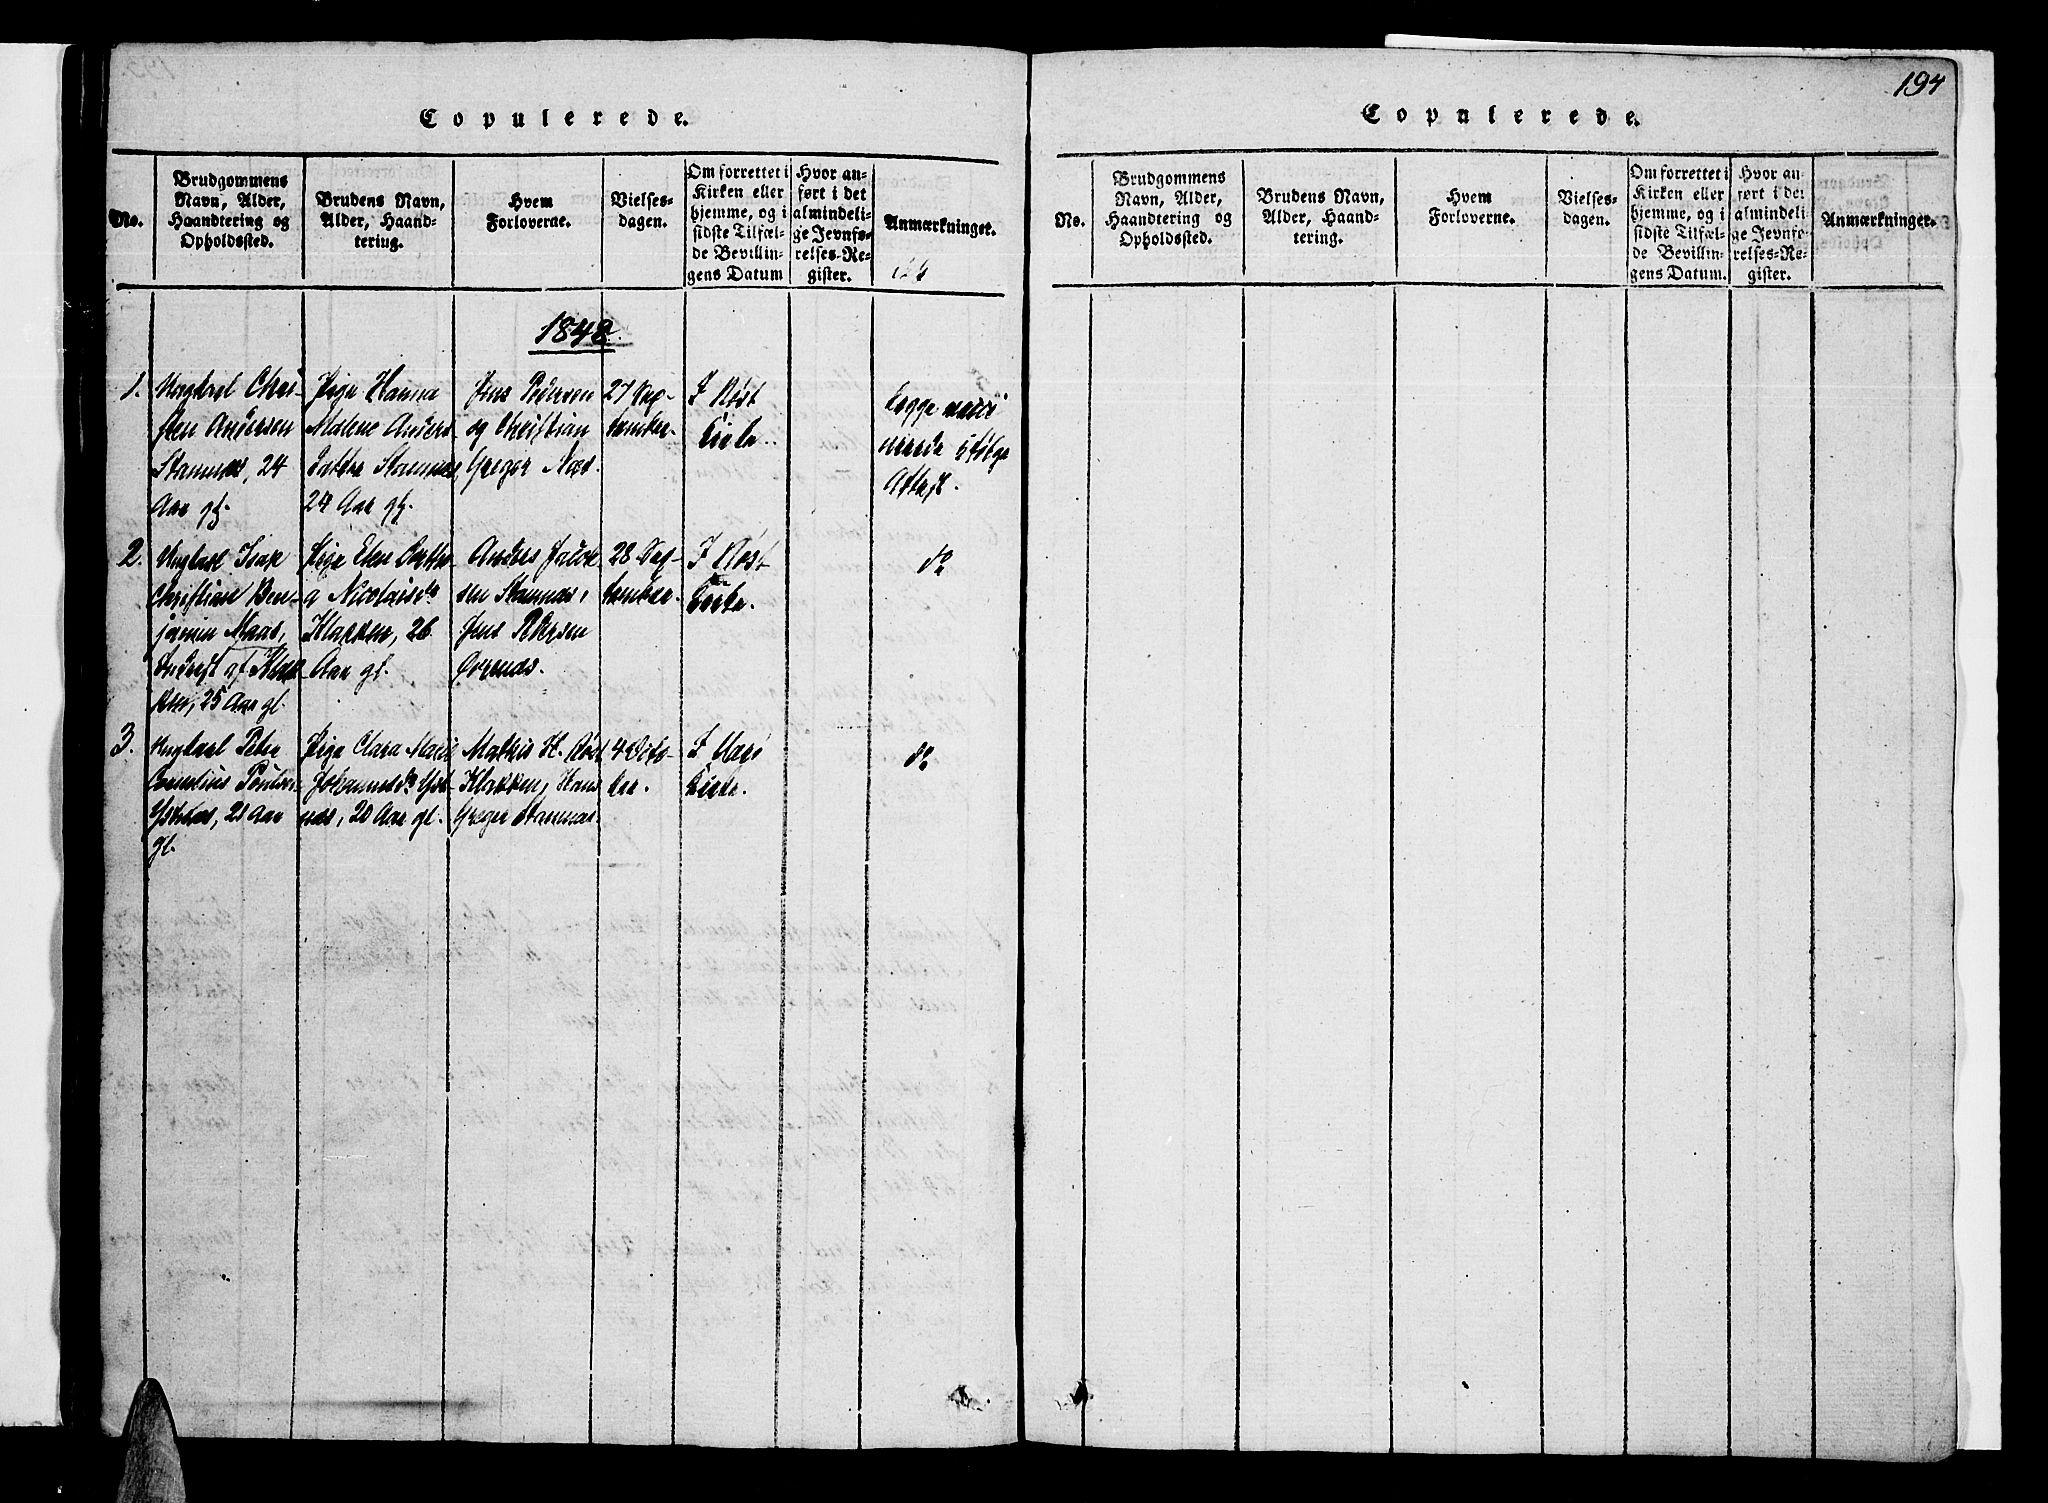 SAT, Ministerialprotokoller, klokkerbøker og fødselsregistre - Nordland, 807/L0120: Ministerialbok nr. 807A03, 1821-1848, s. 194